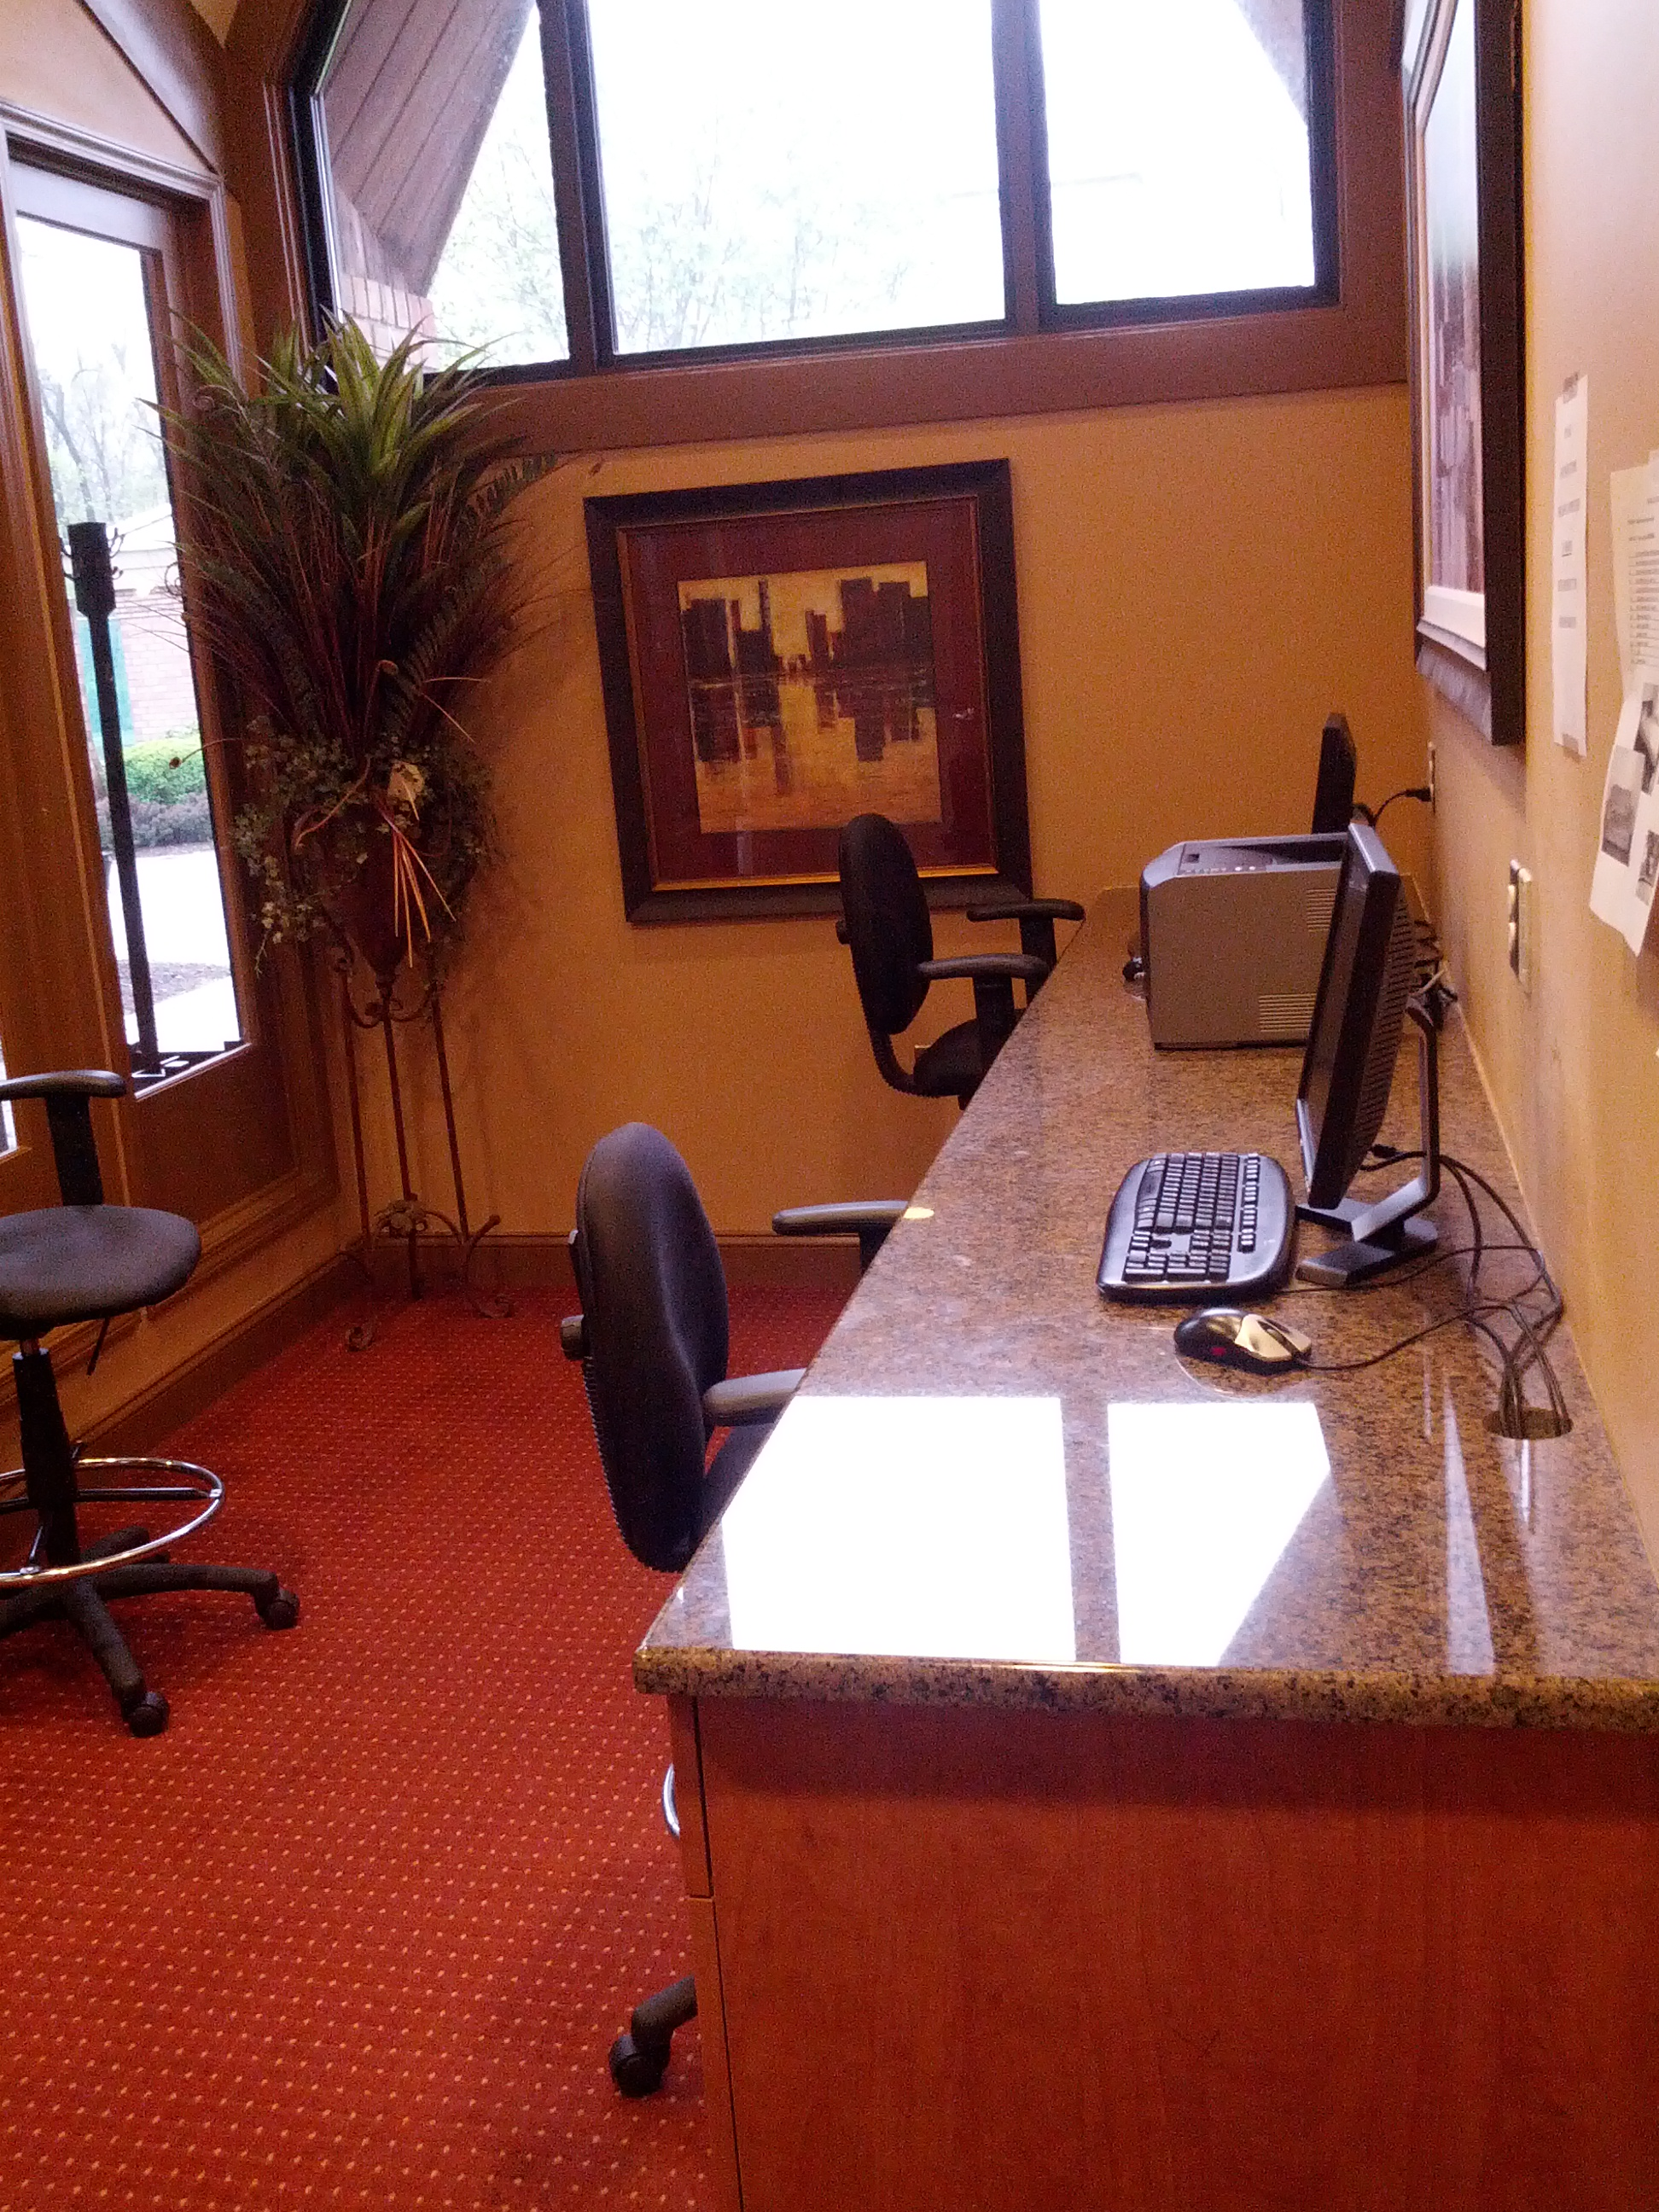 North Brunswick Temporary Housing office center